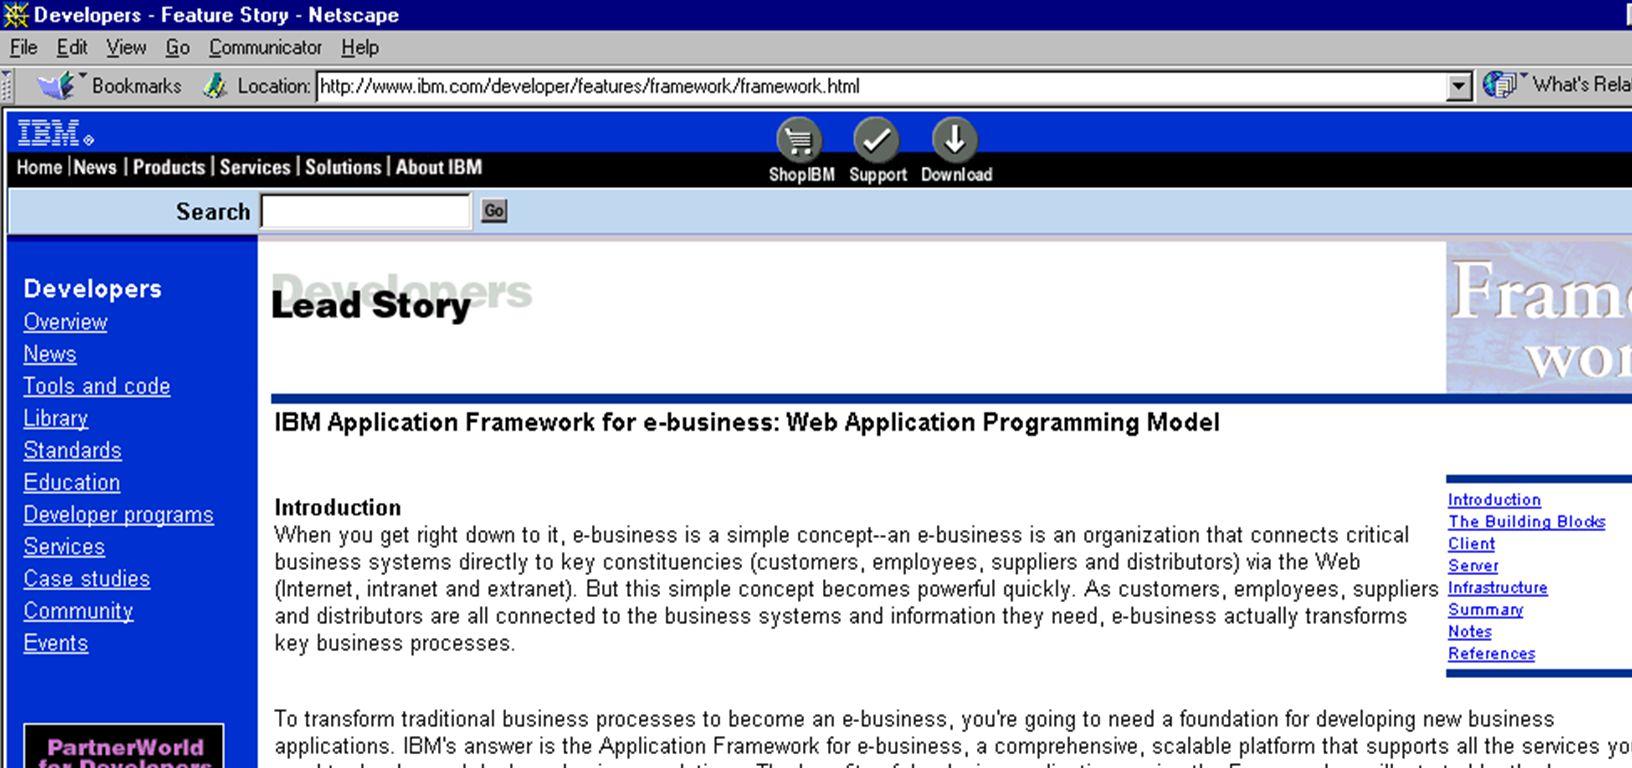 vrije Universiteit amsterdamPostacademische Cursus Informatie Technologie Recurring questions - Web Applications What is the economic model? Does it s